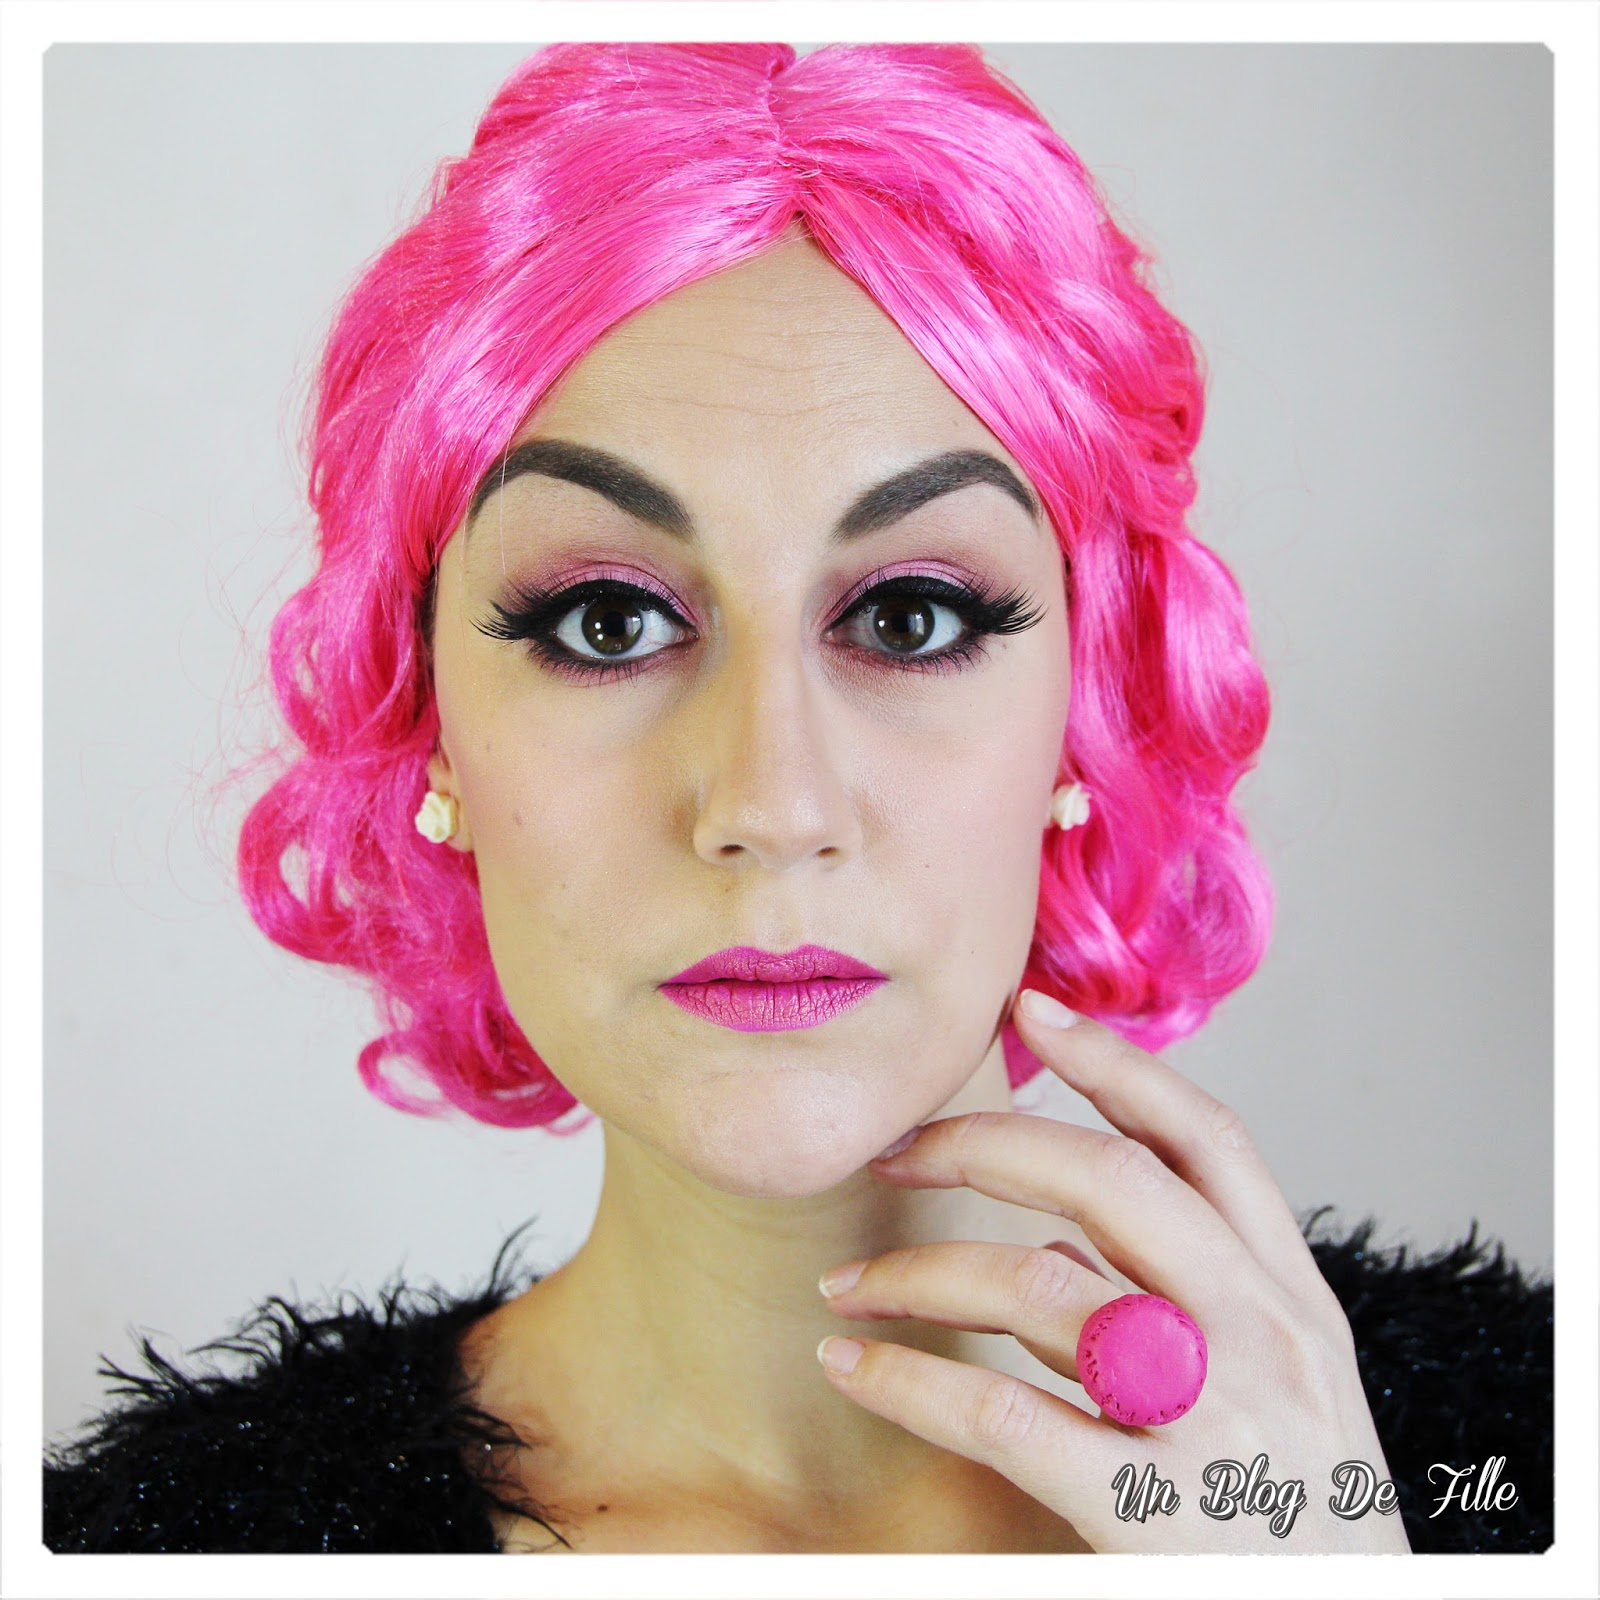 http://unblogdefille.blogspot.fr/2018/02/maquillage-carnaval-en-rose-neon-et.html